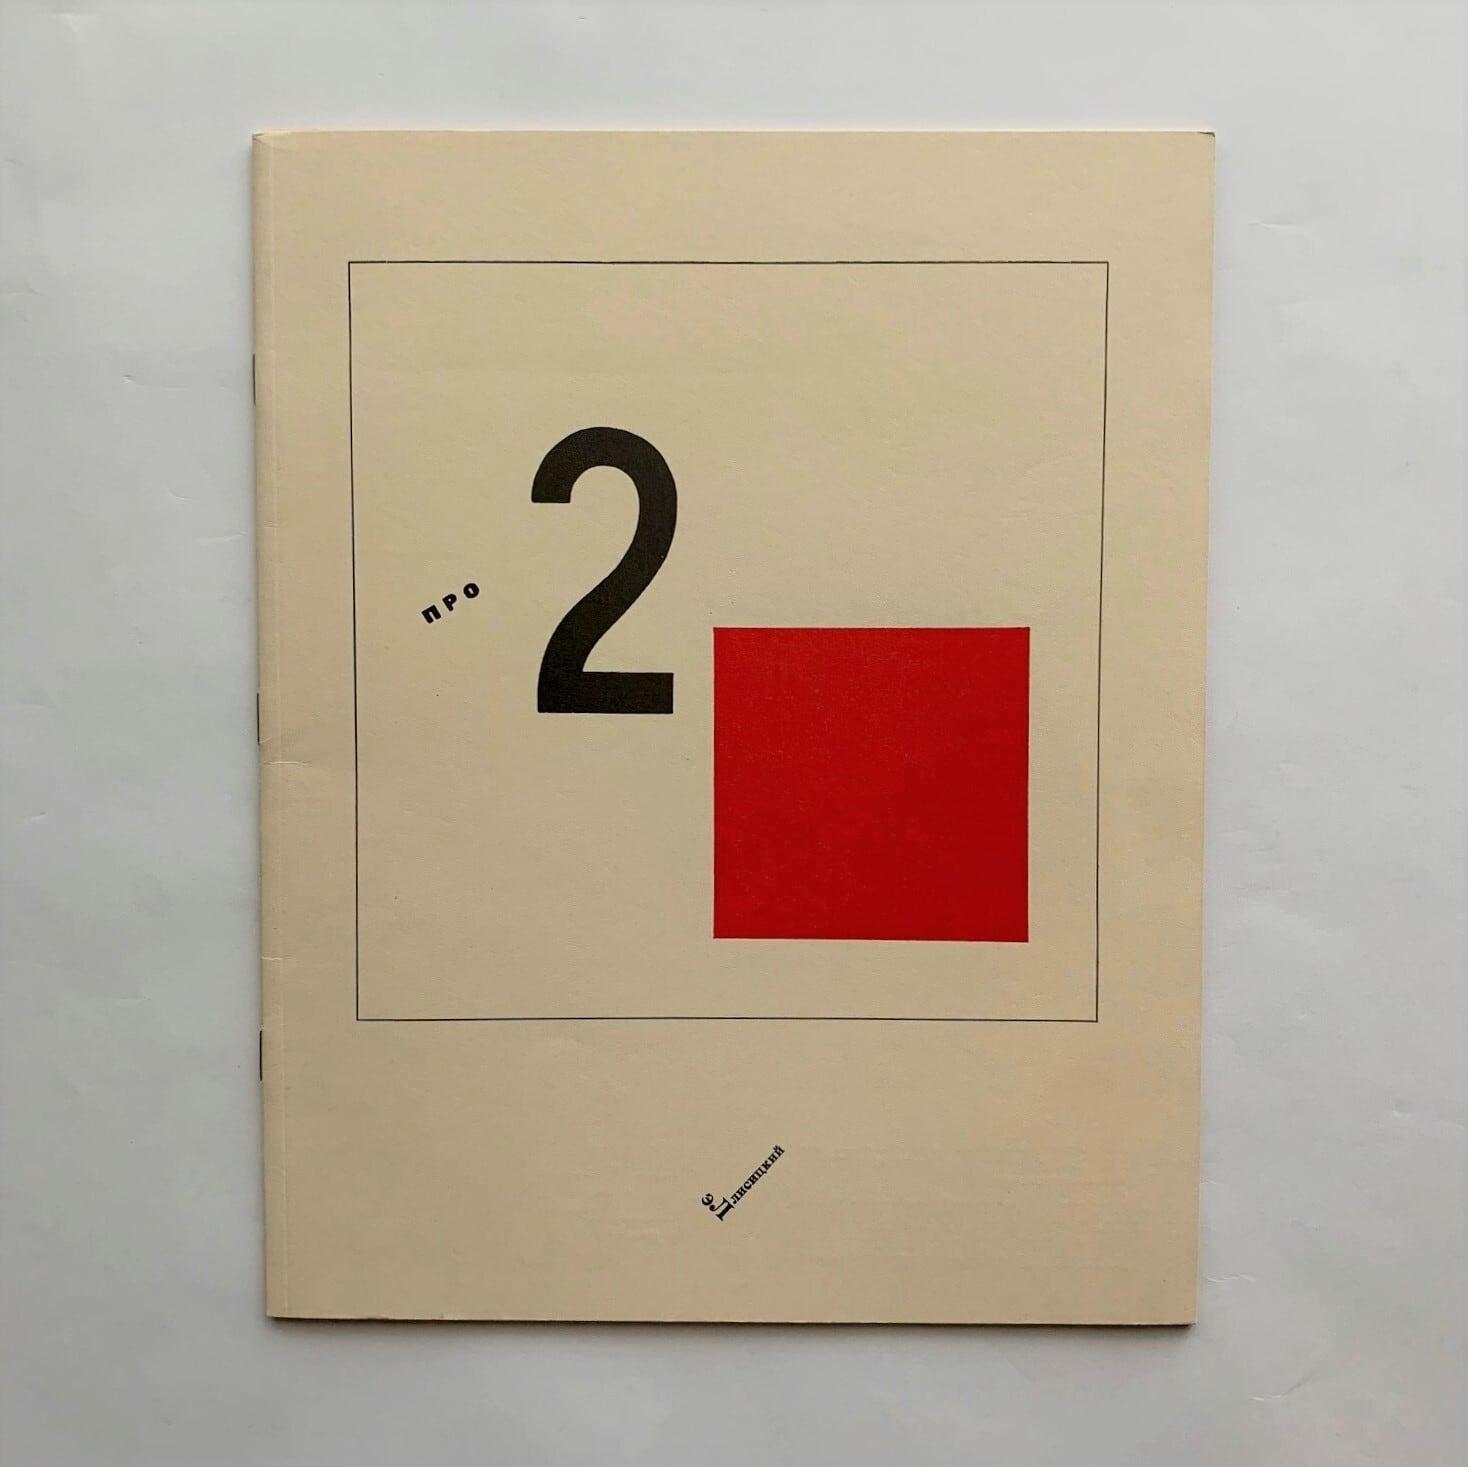 Pro Dva Kvadrata (About Two Squares)  More About 2 Squares / エル・リシツキー, Patricia Railing